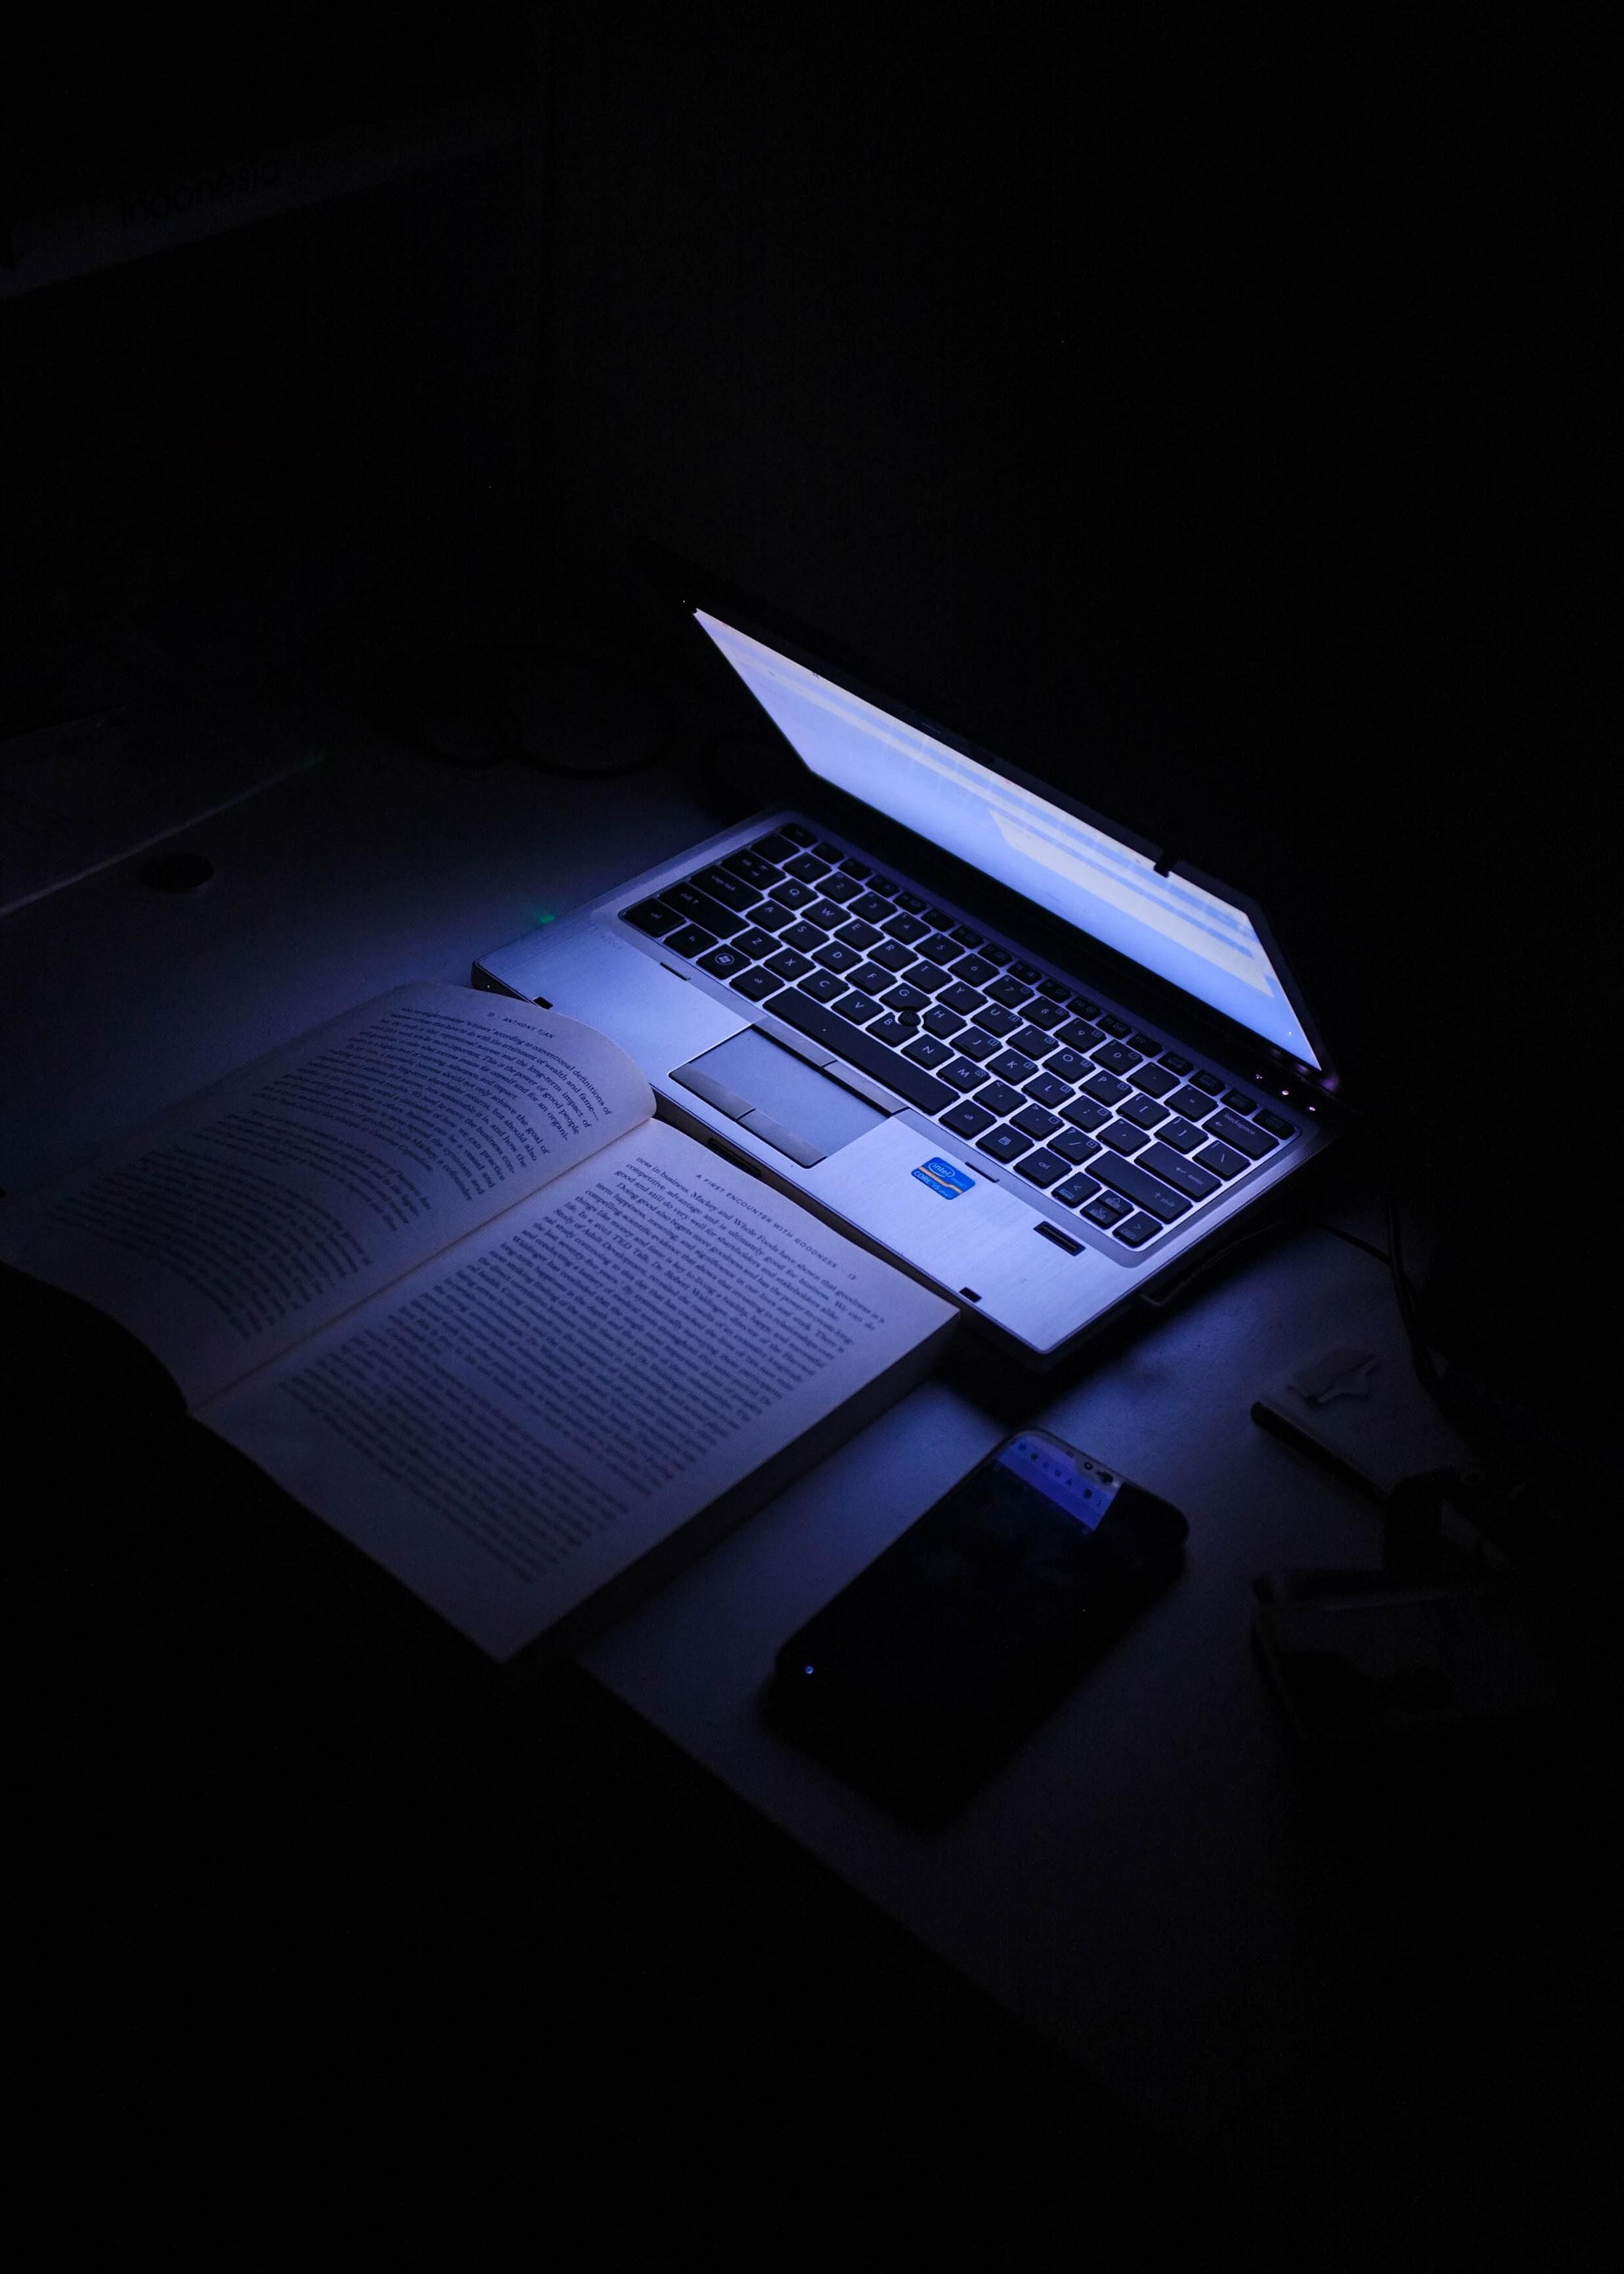 laptop, unsplash